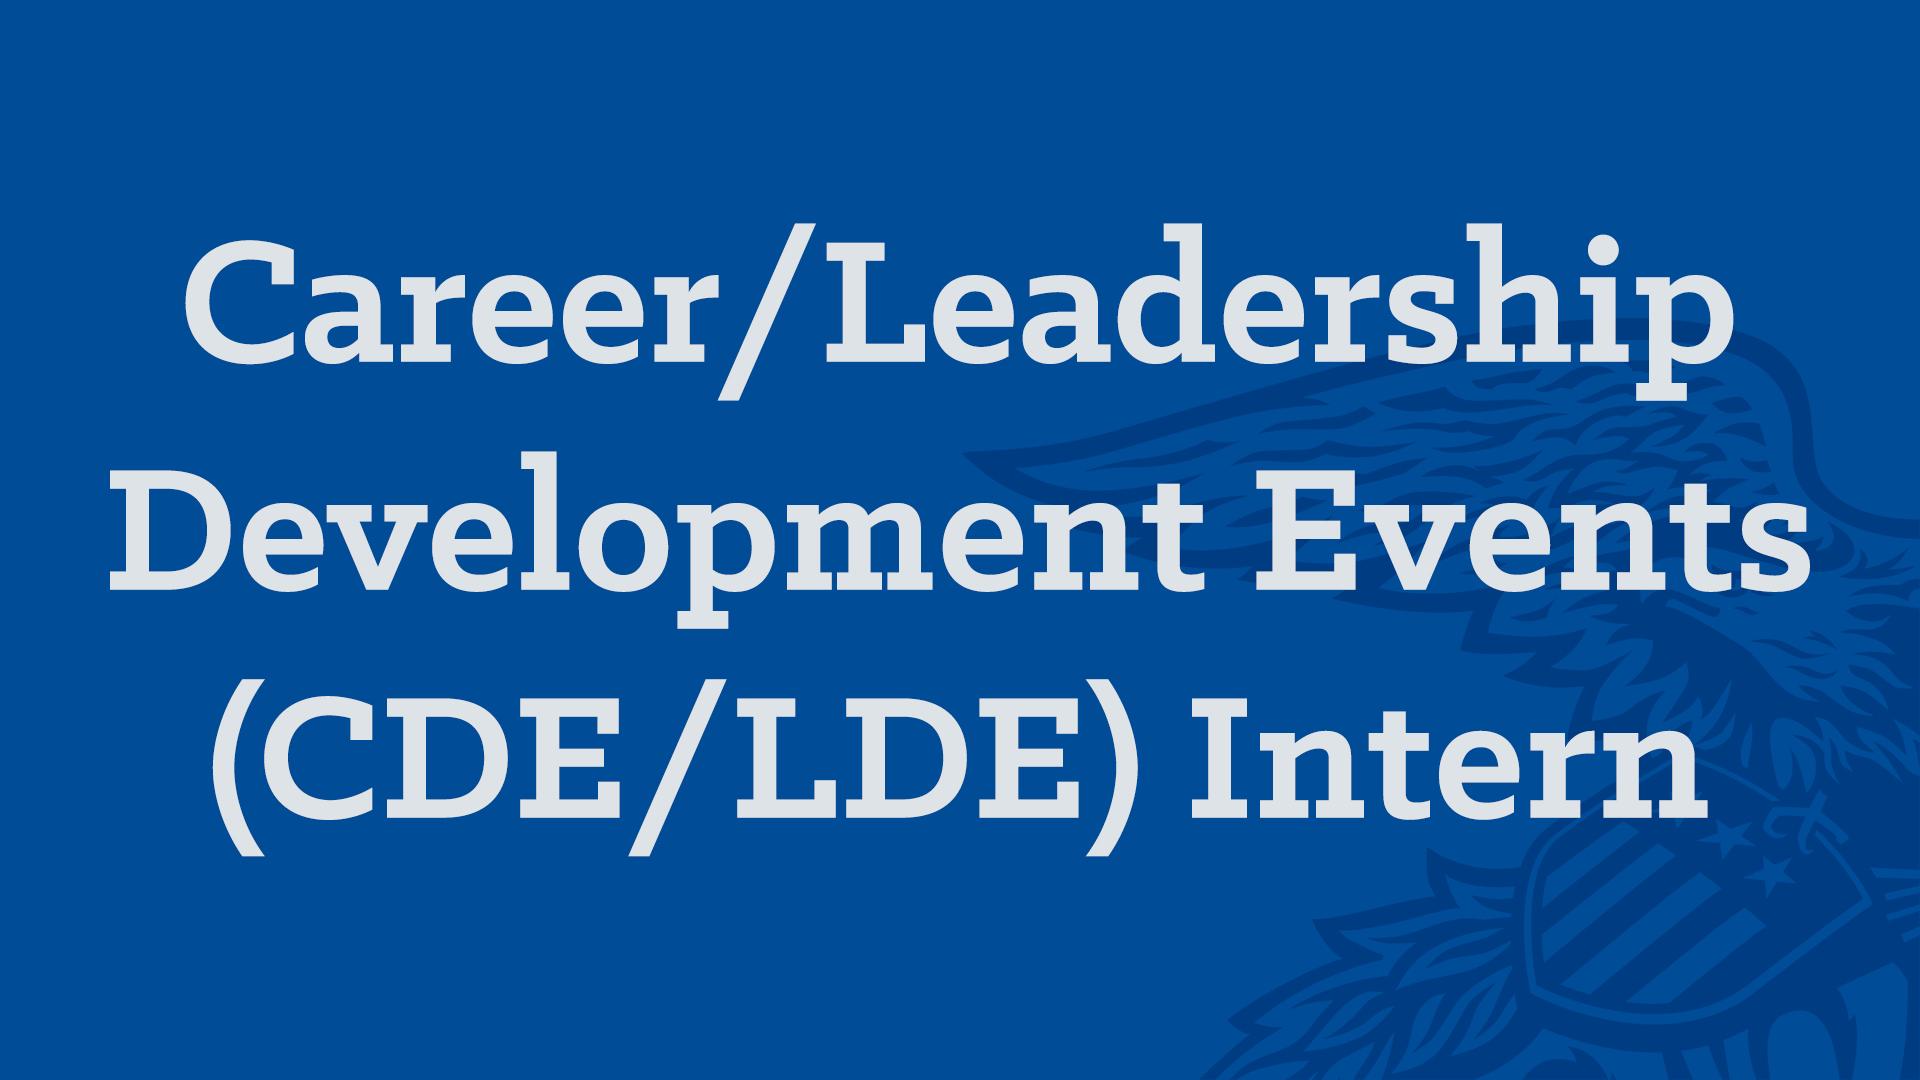 CDE-LDE Intern